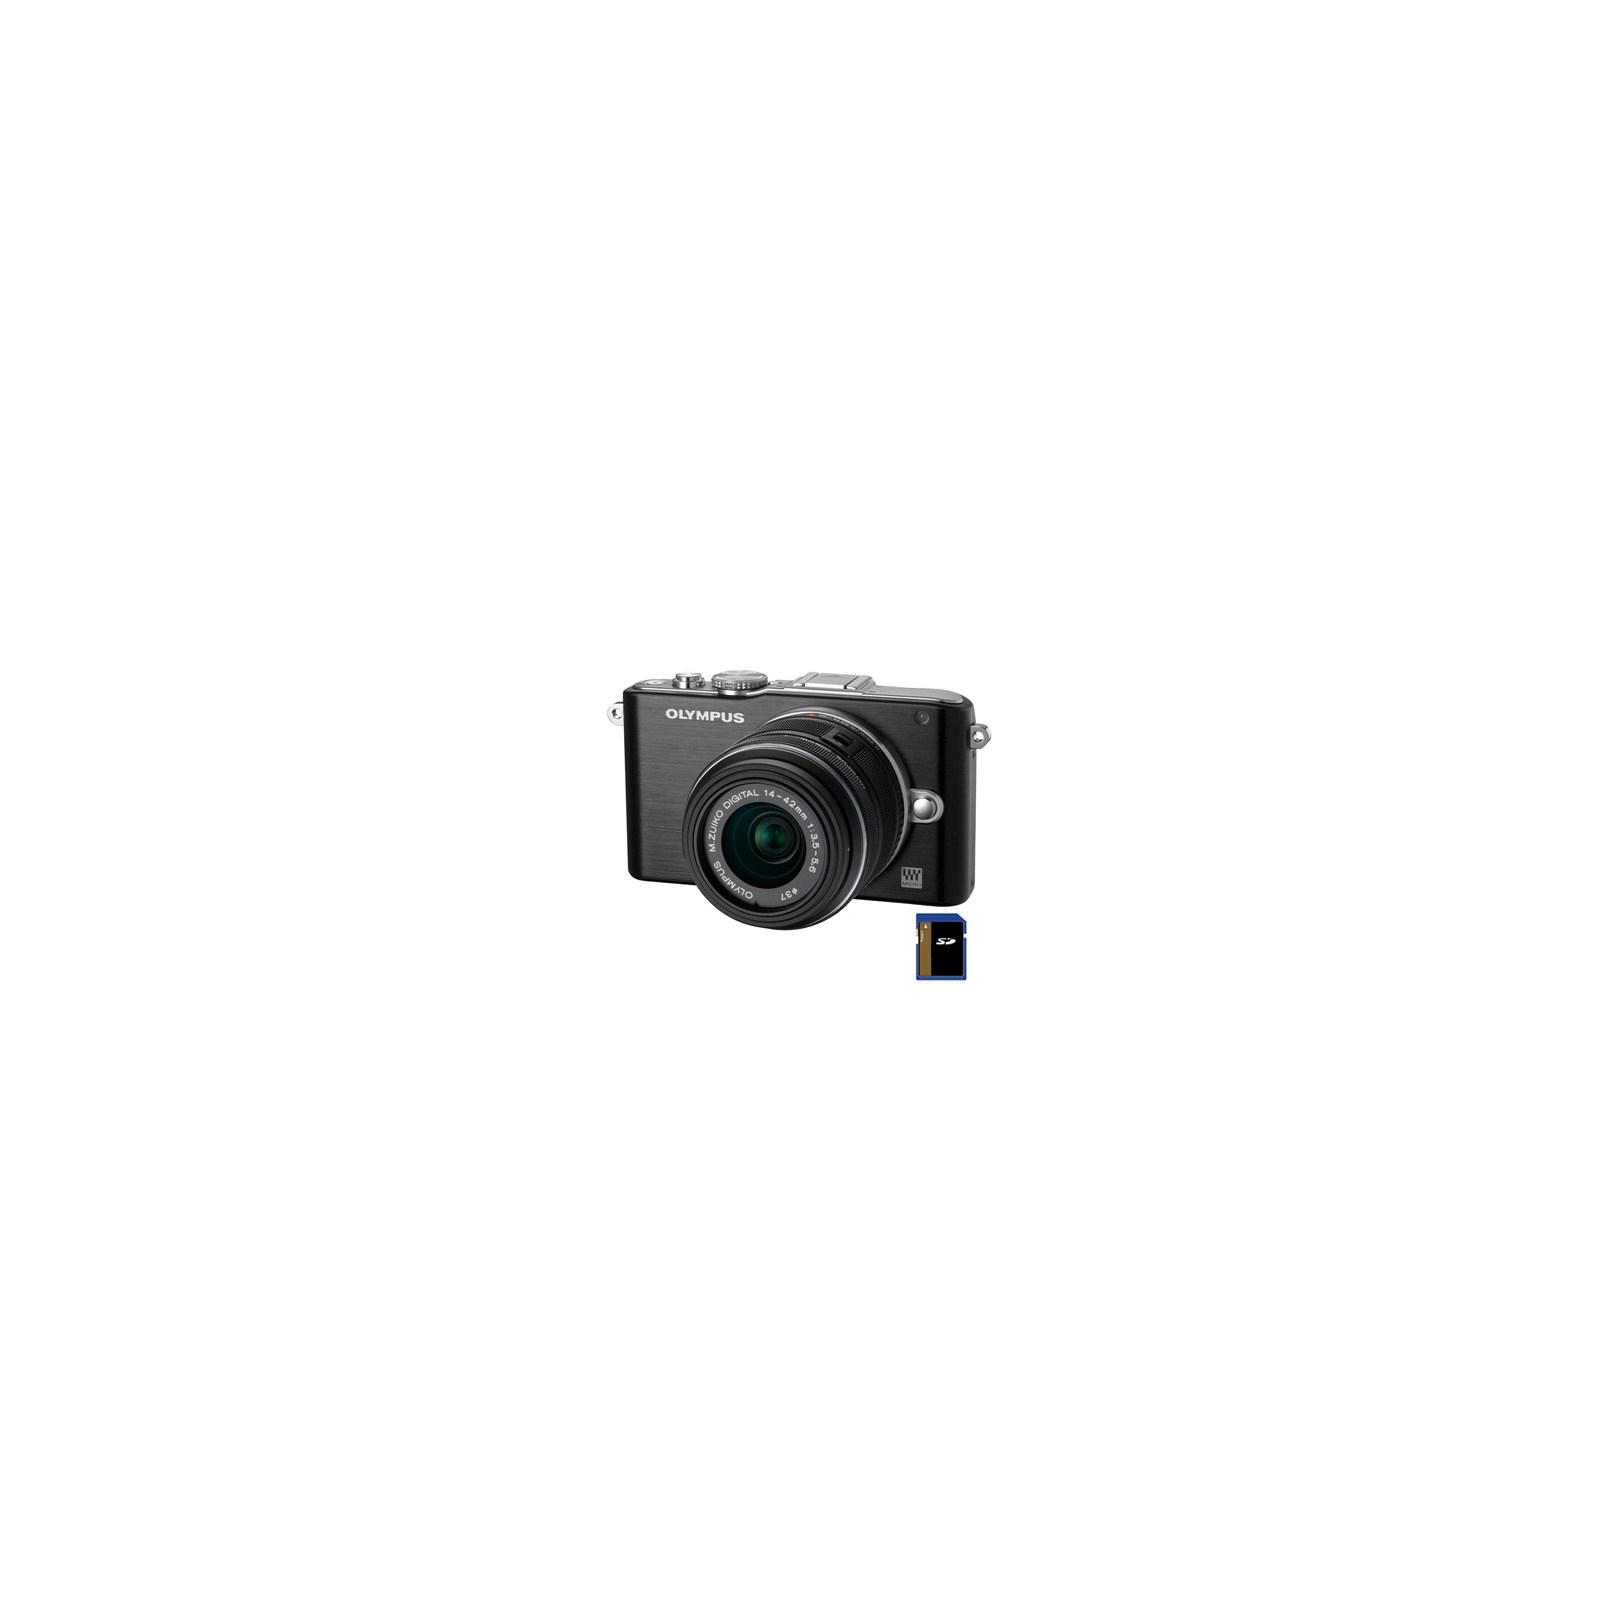 Цифровой фотоаппарат OLYMPUS PEN E-PL3 14-42 mm kit black/black (V20503BBE000/V205031BE000)